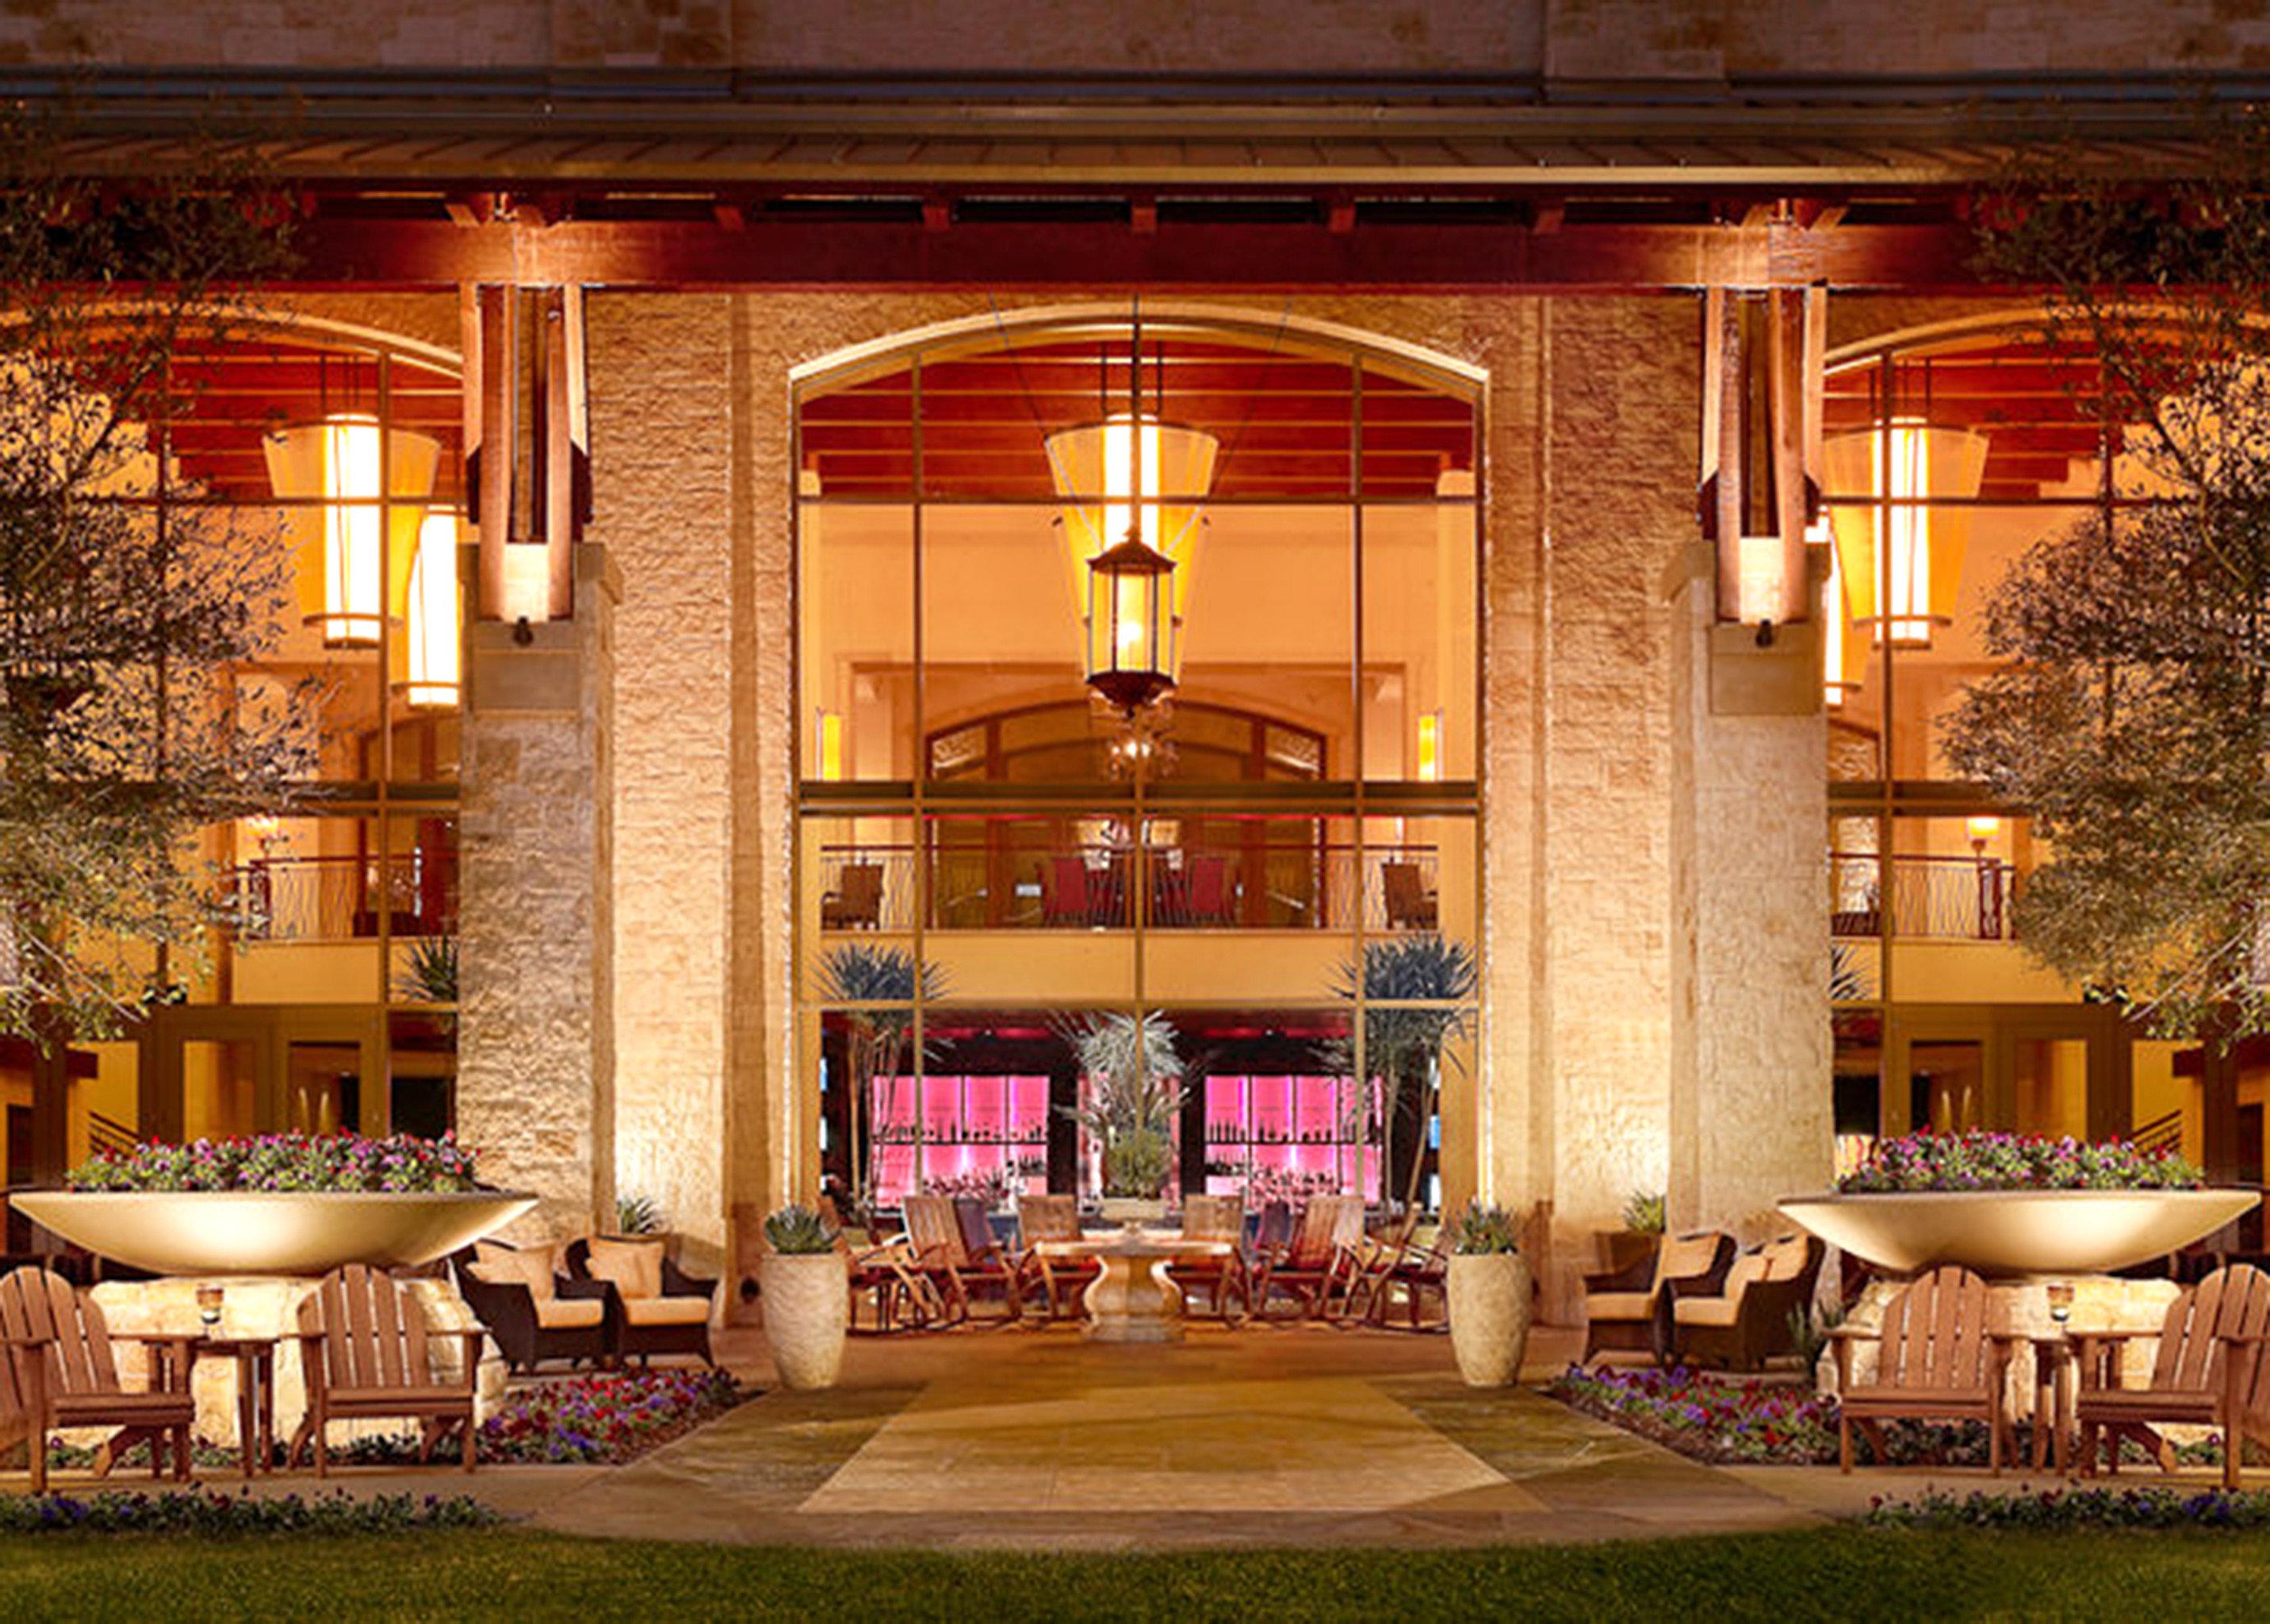 Family Lounge Patio Resort Terrace Lobby palace mansion function hall ballroom